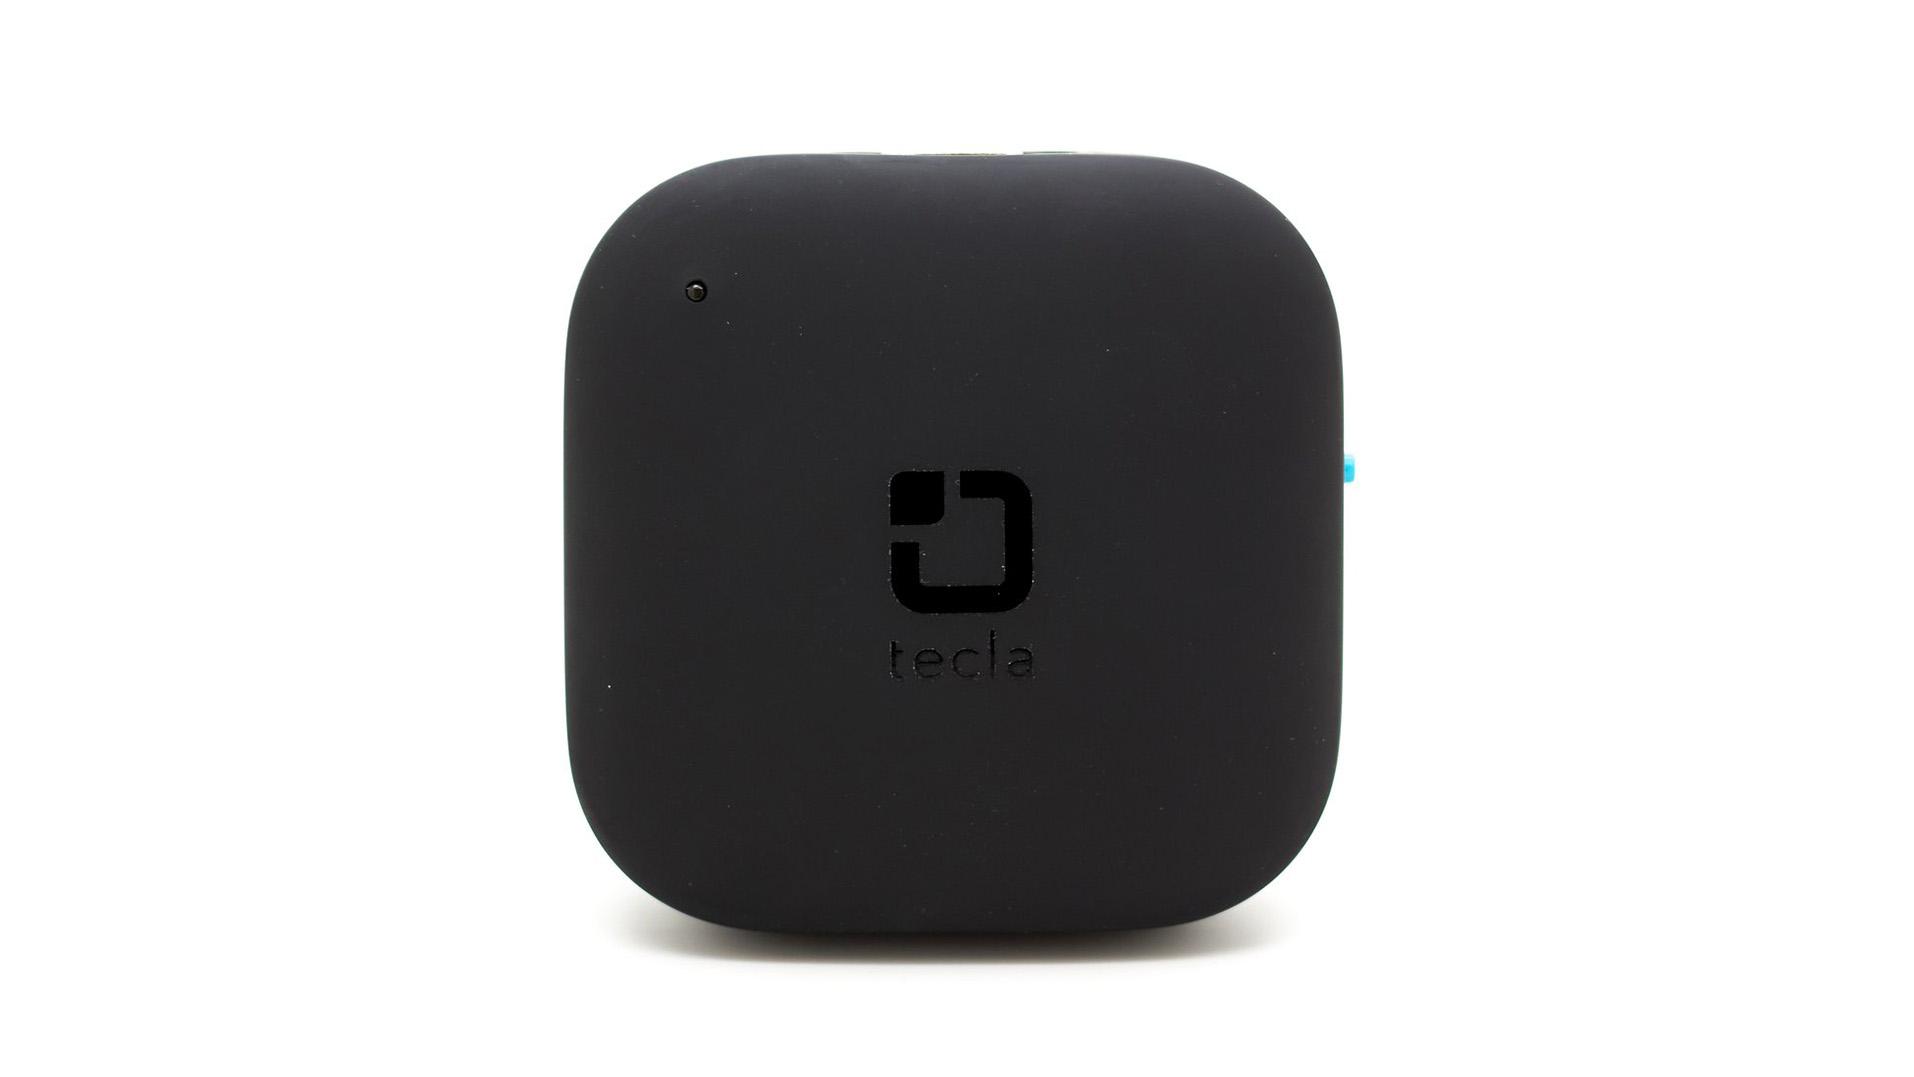 product image of tecla, a black little box